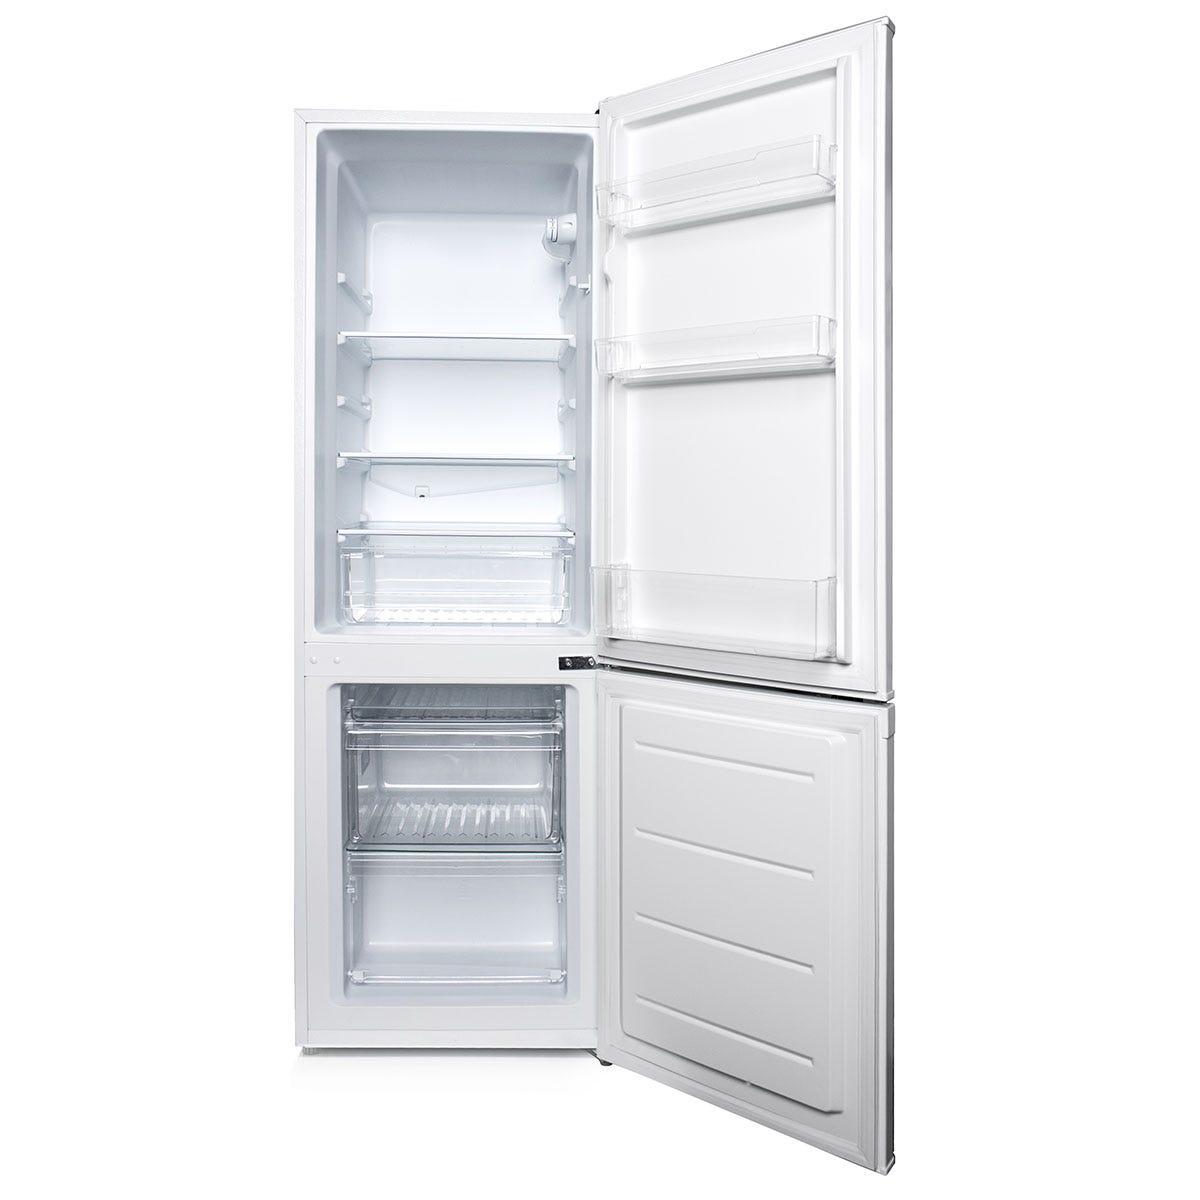 Haden HK139W 50cm 70:30 Split Fridge Freezer - White